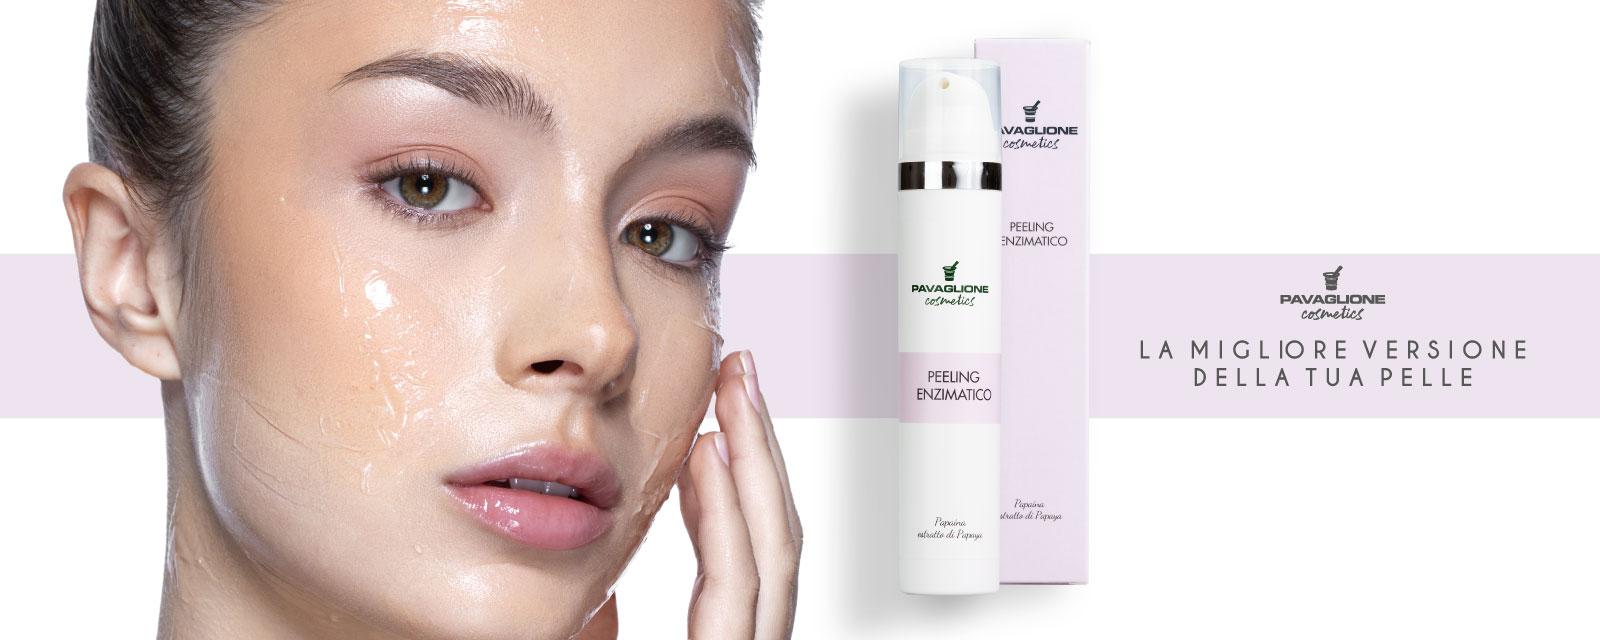 Pavaglione Cosmetics Peeling Enzimatico banner